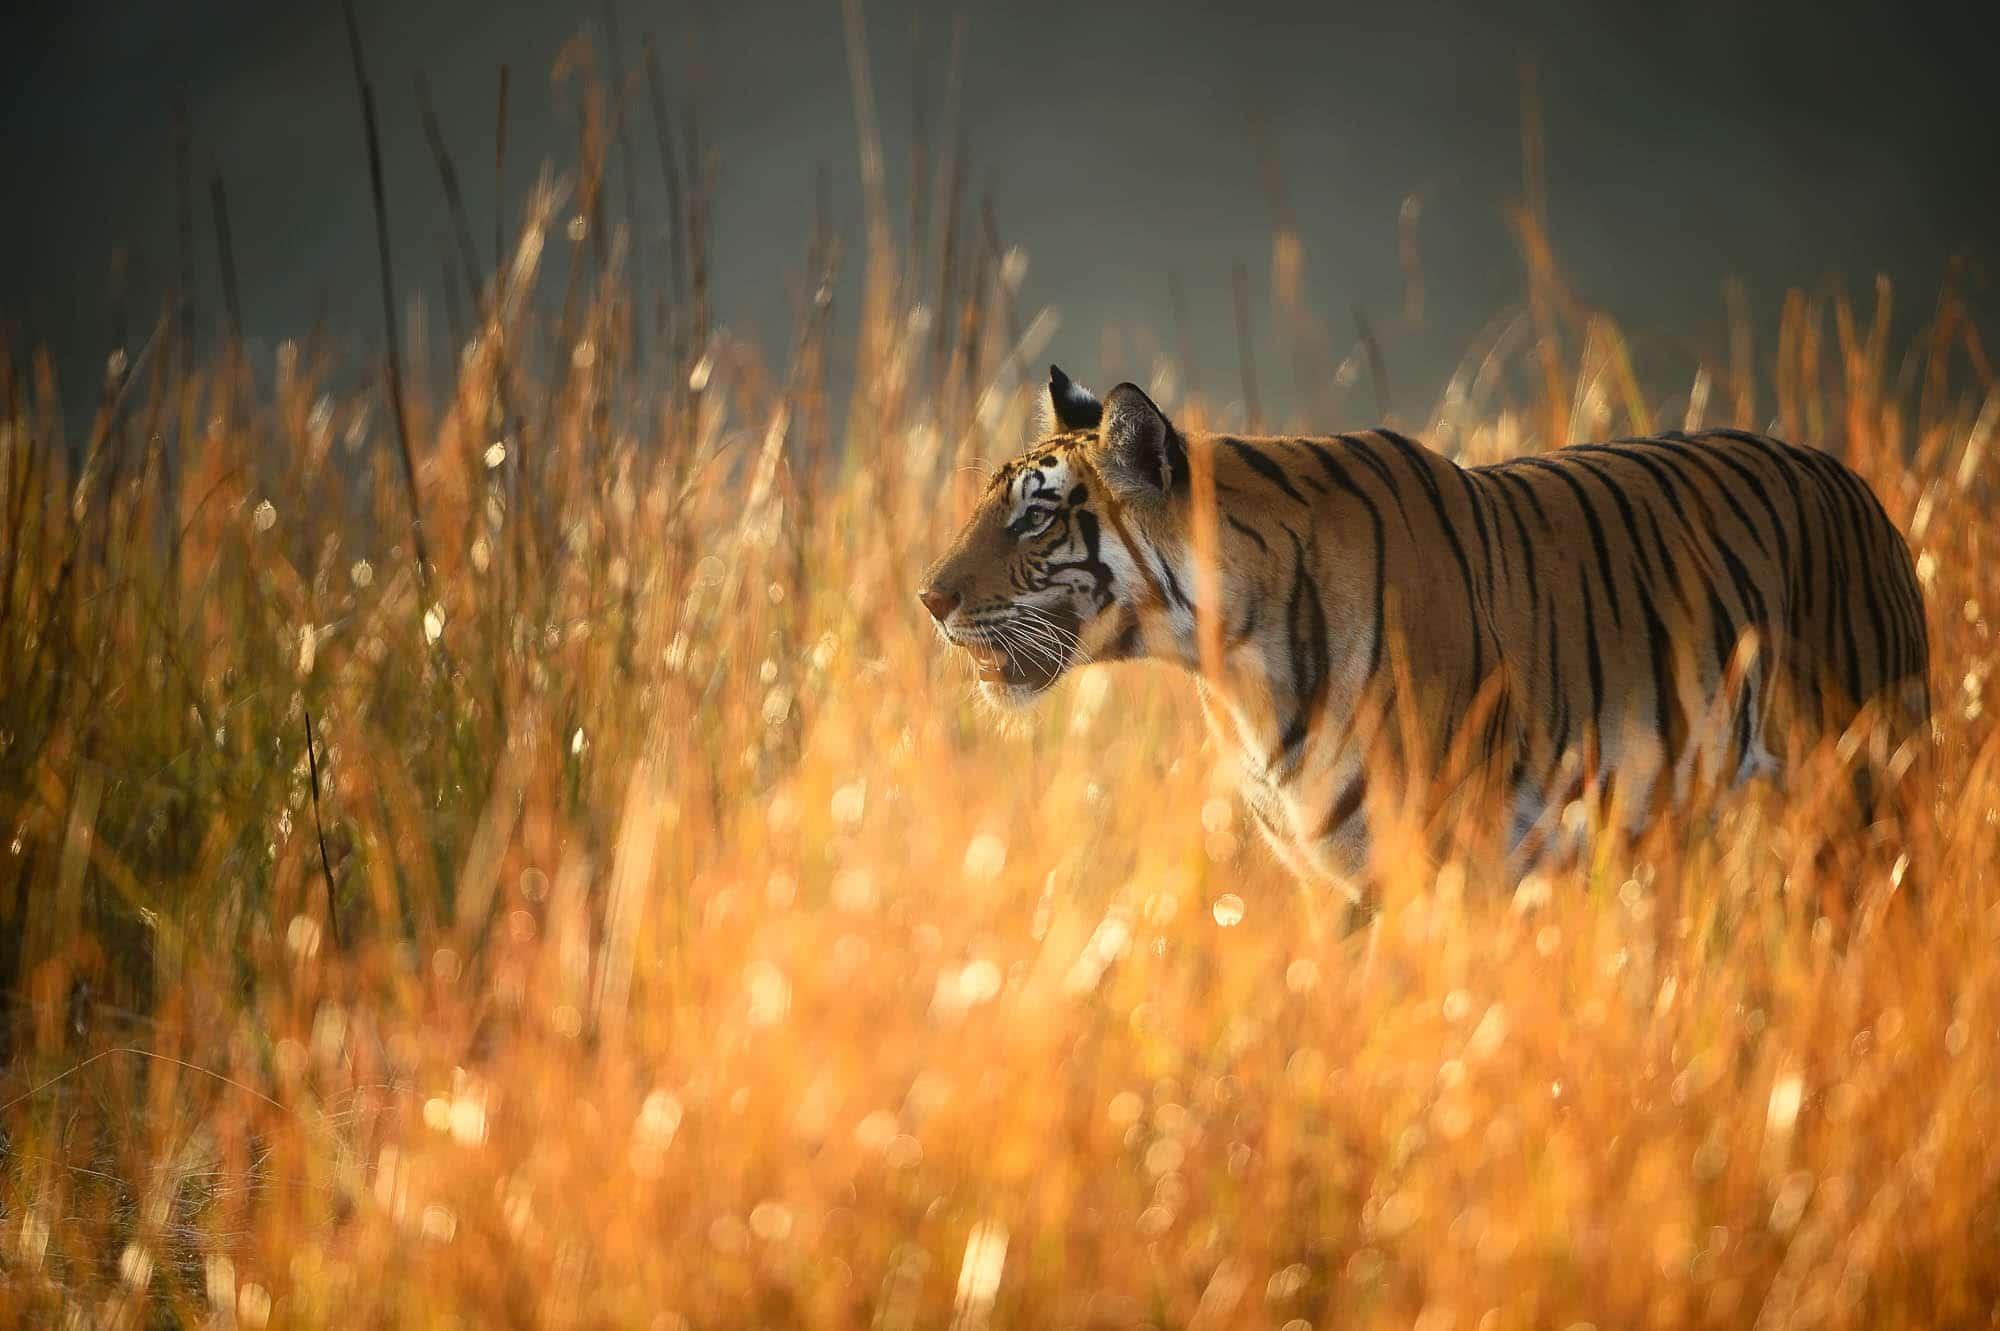 Tiger Backlit Grass -Bandhavgarh - Ranthambore - Tiger Photography Tour